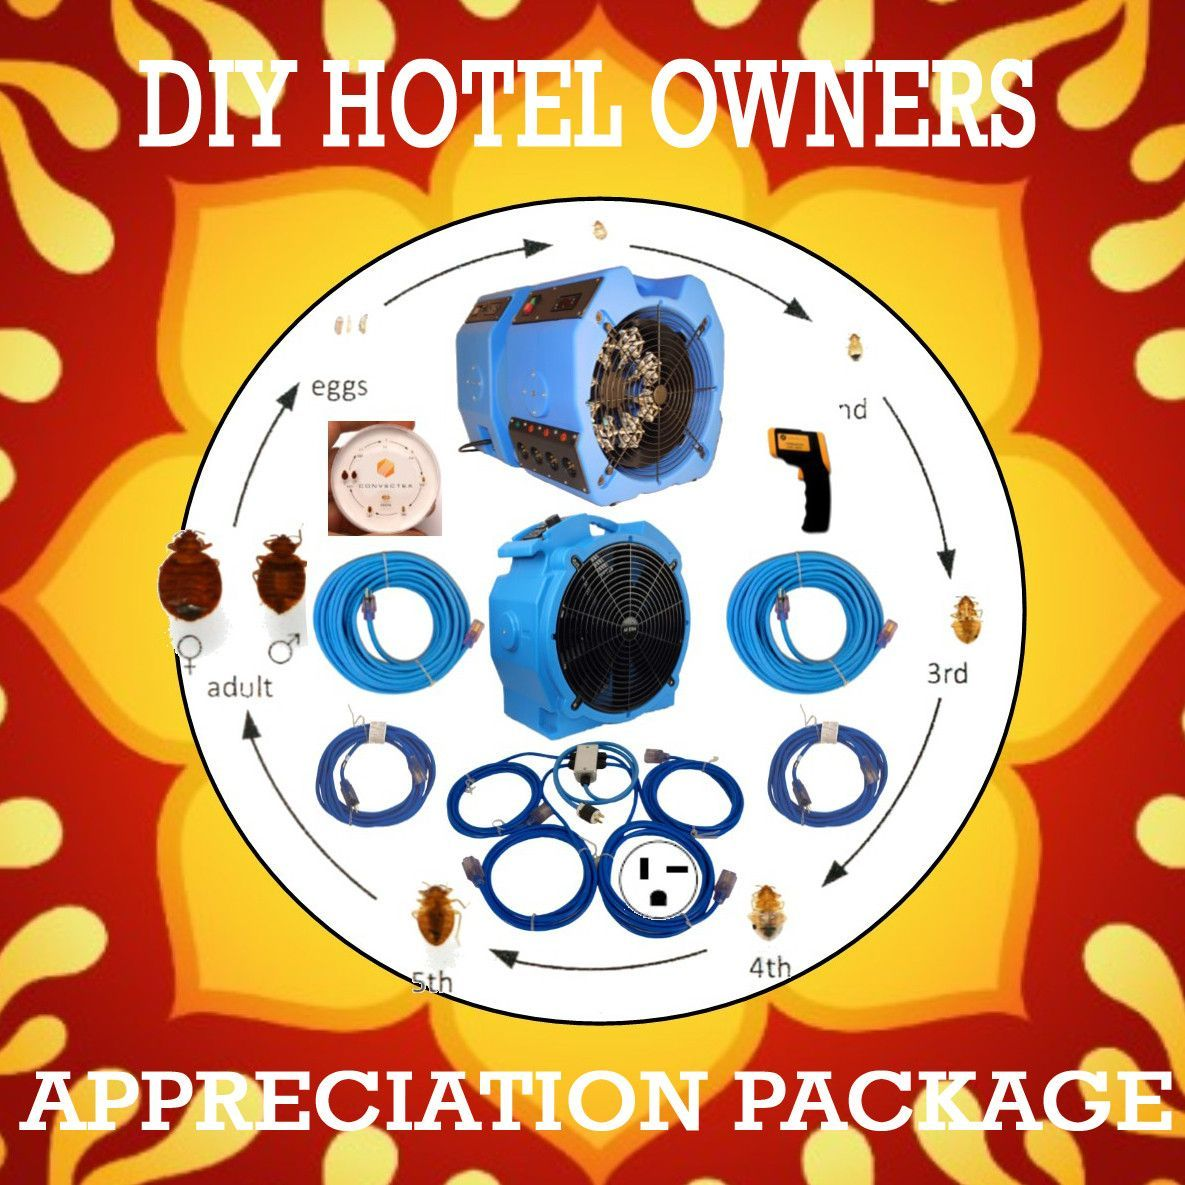 DIY Hotel Owners Appreciation Heat Package Hotel owner